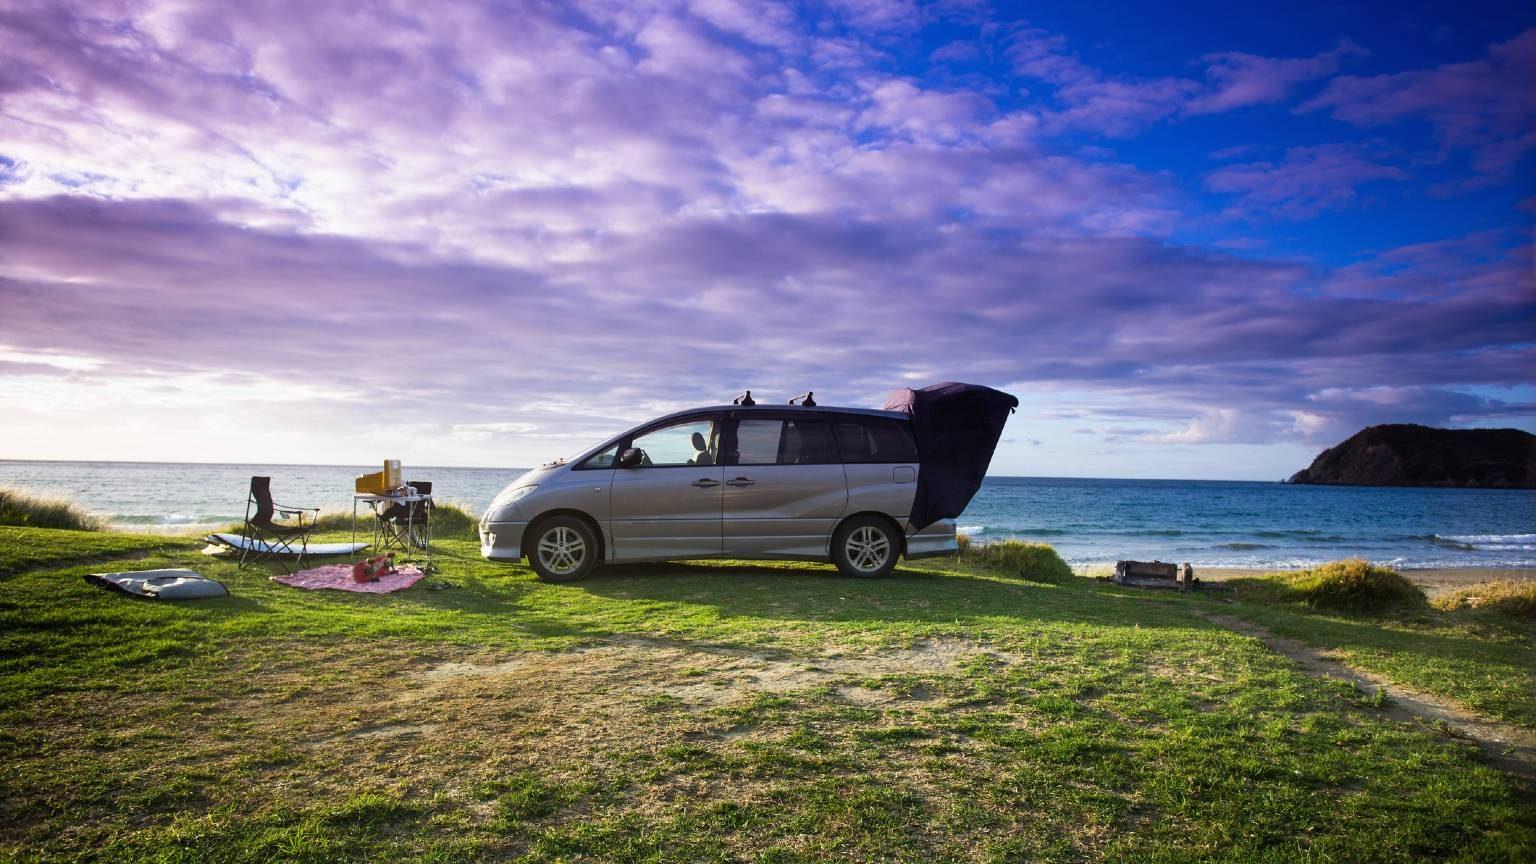 Campervan on beach in New Zealand.